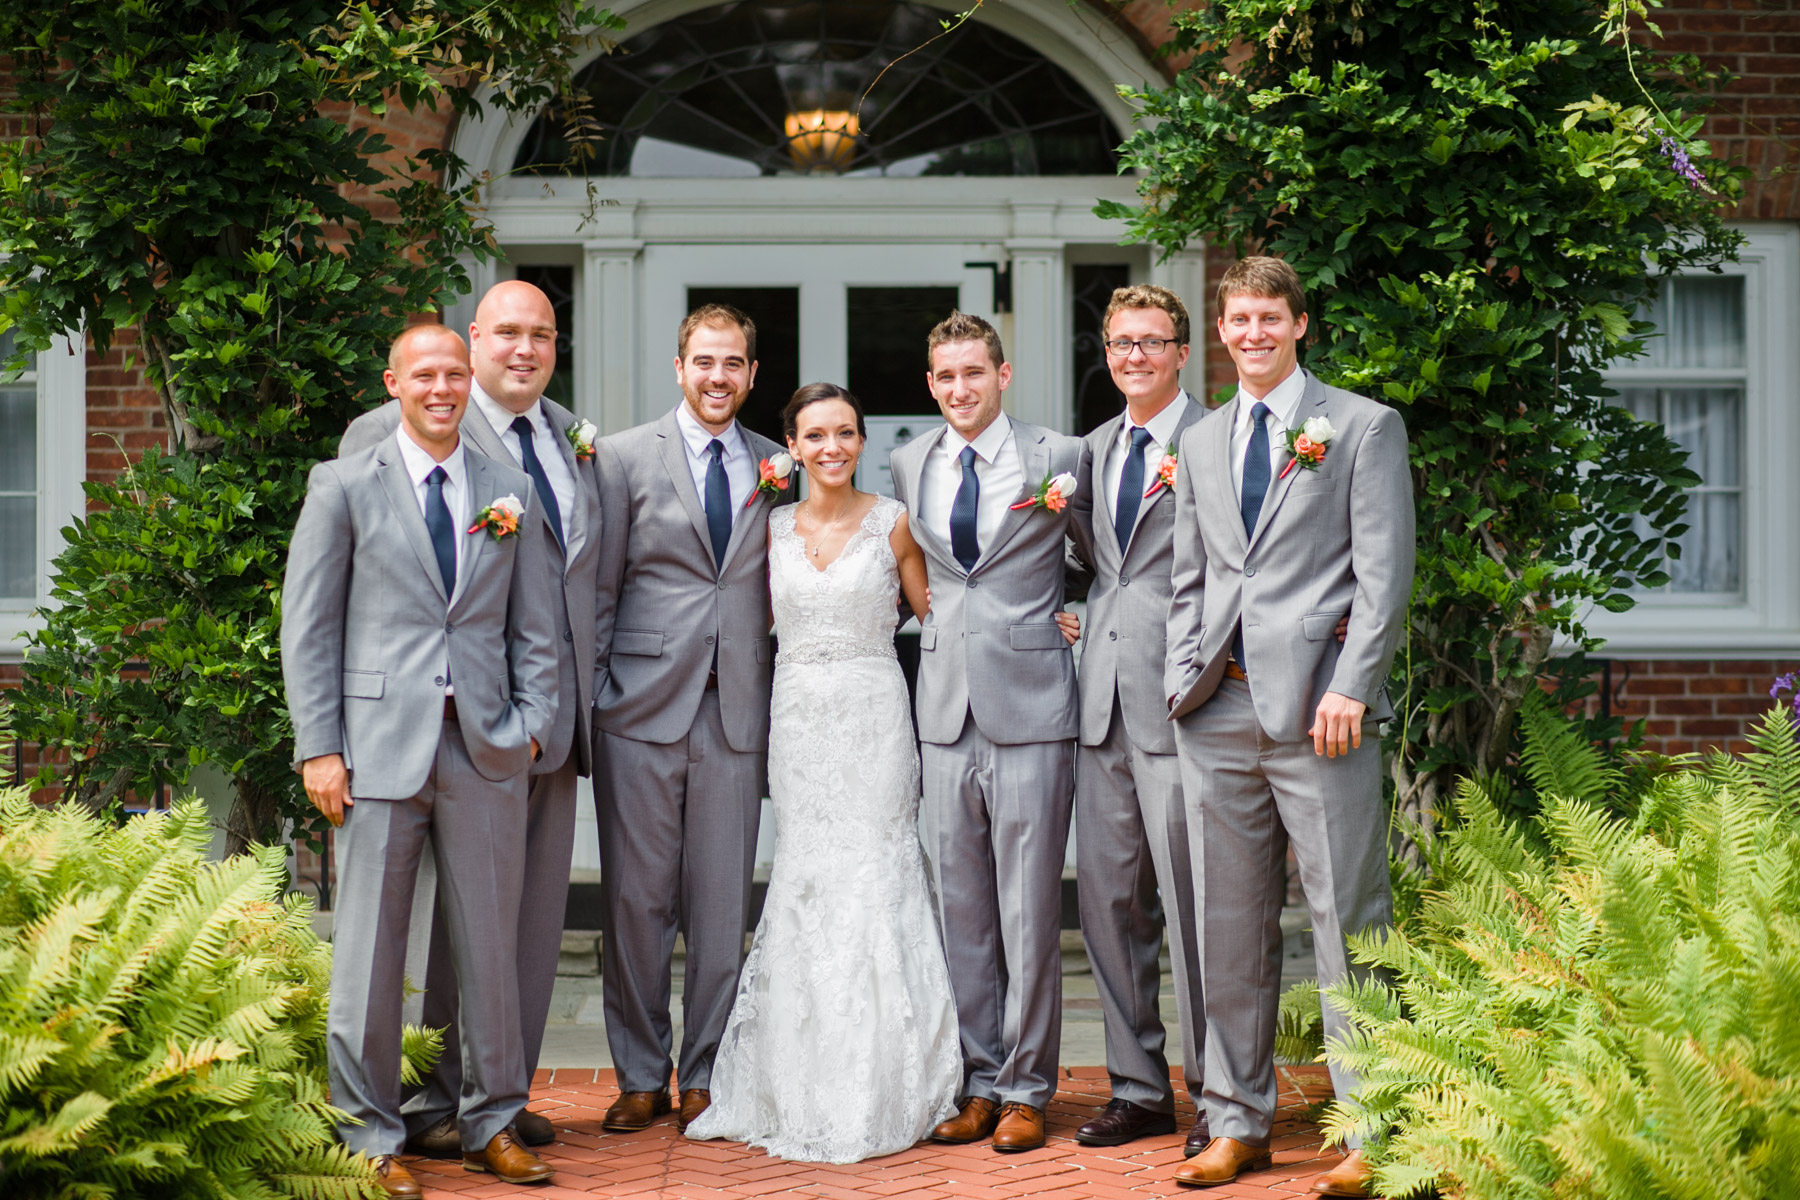 wildwood-park-wedding-photos-72.jpg